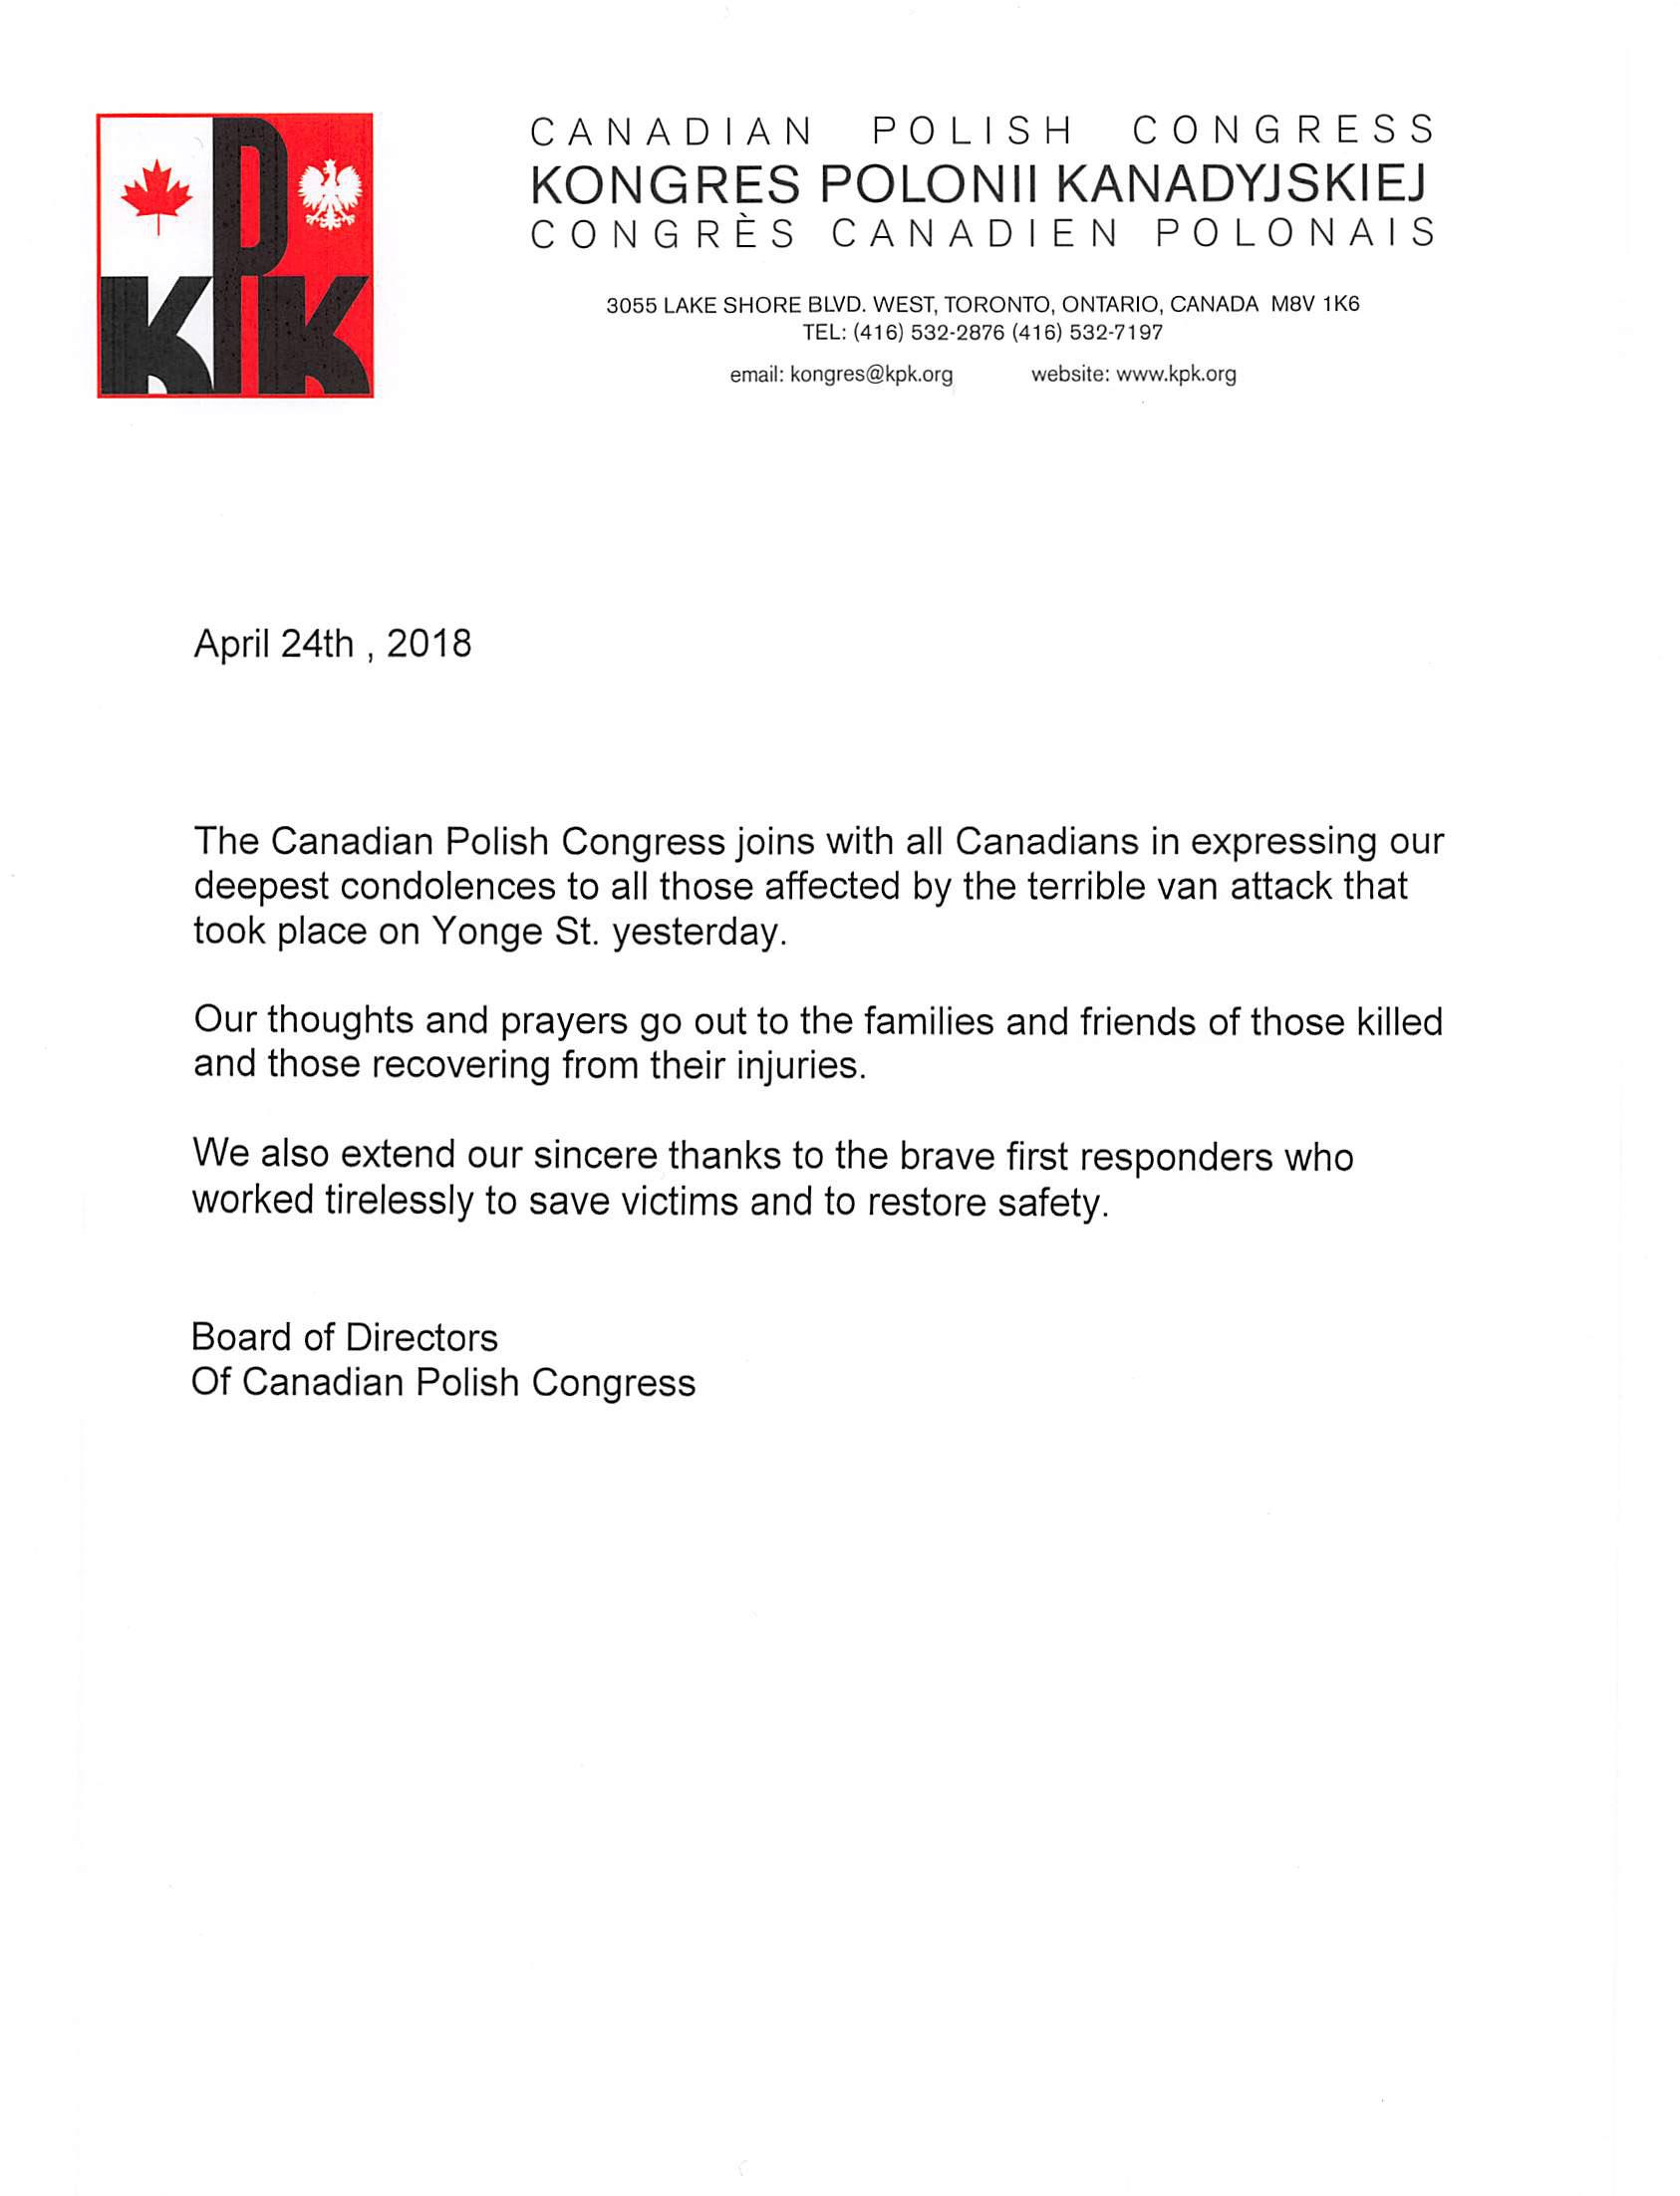 CPC Statement – toronto